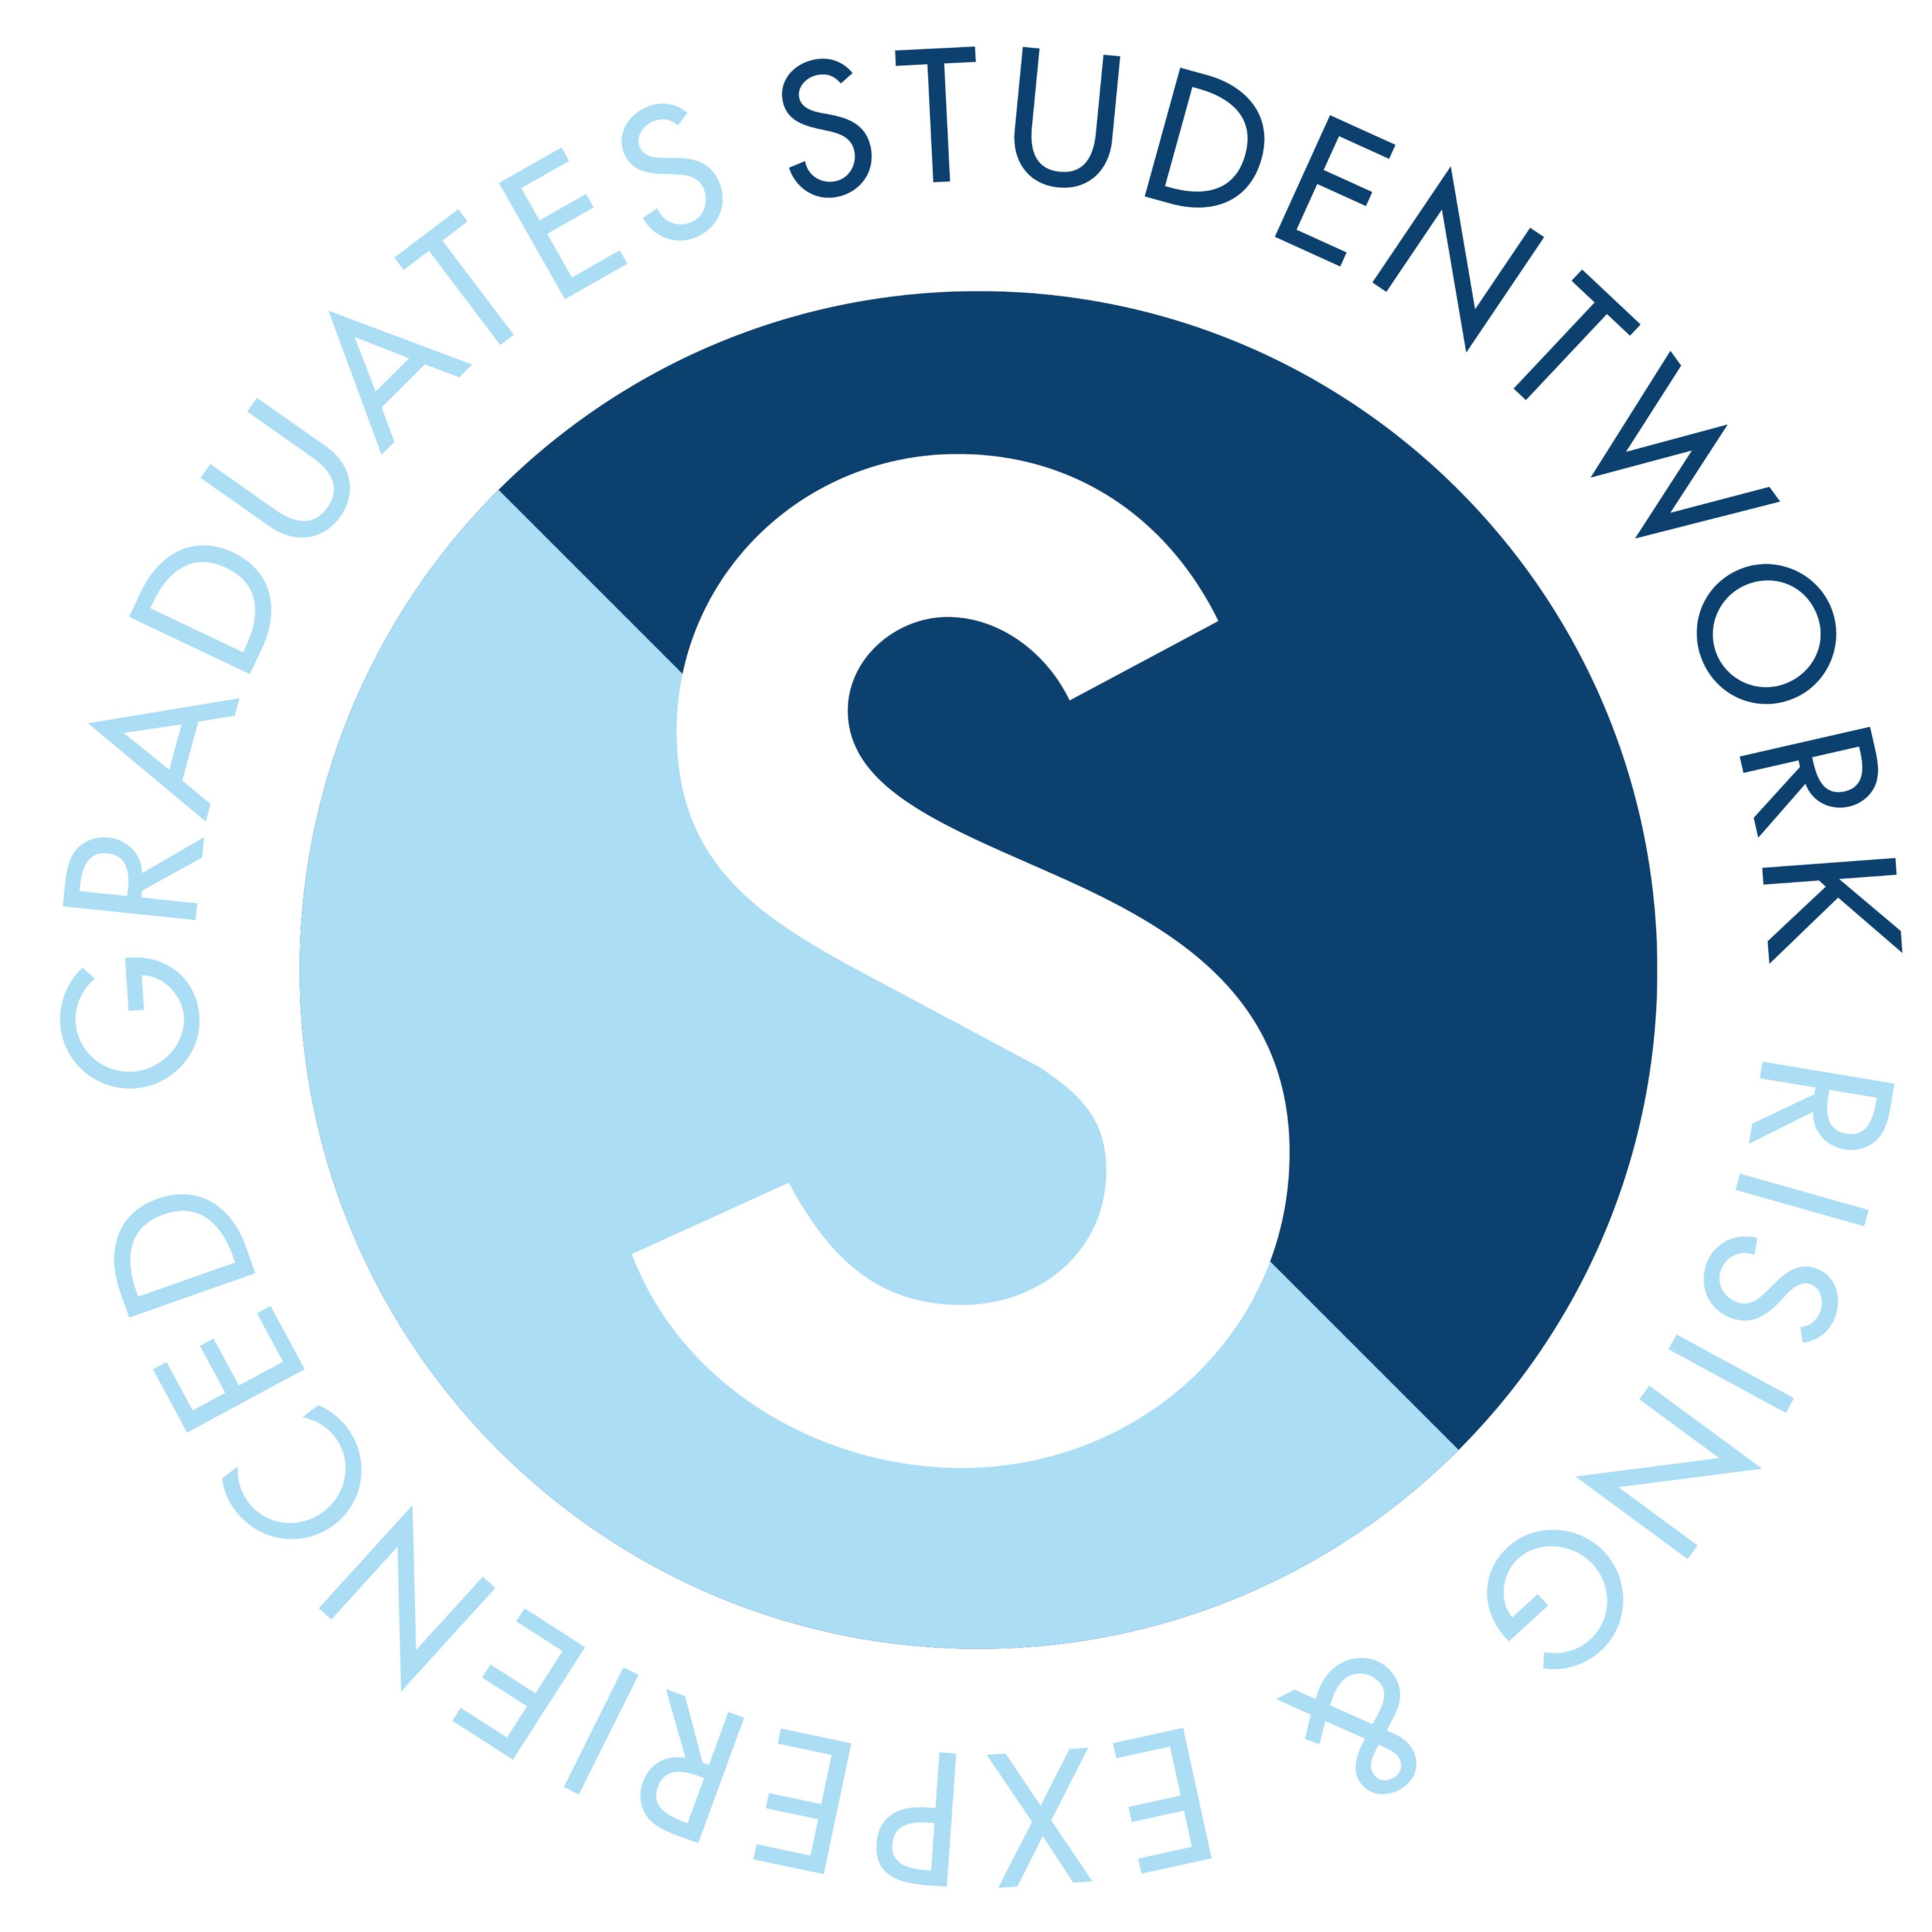 Studentwork Kokemuksia